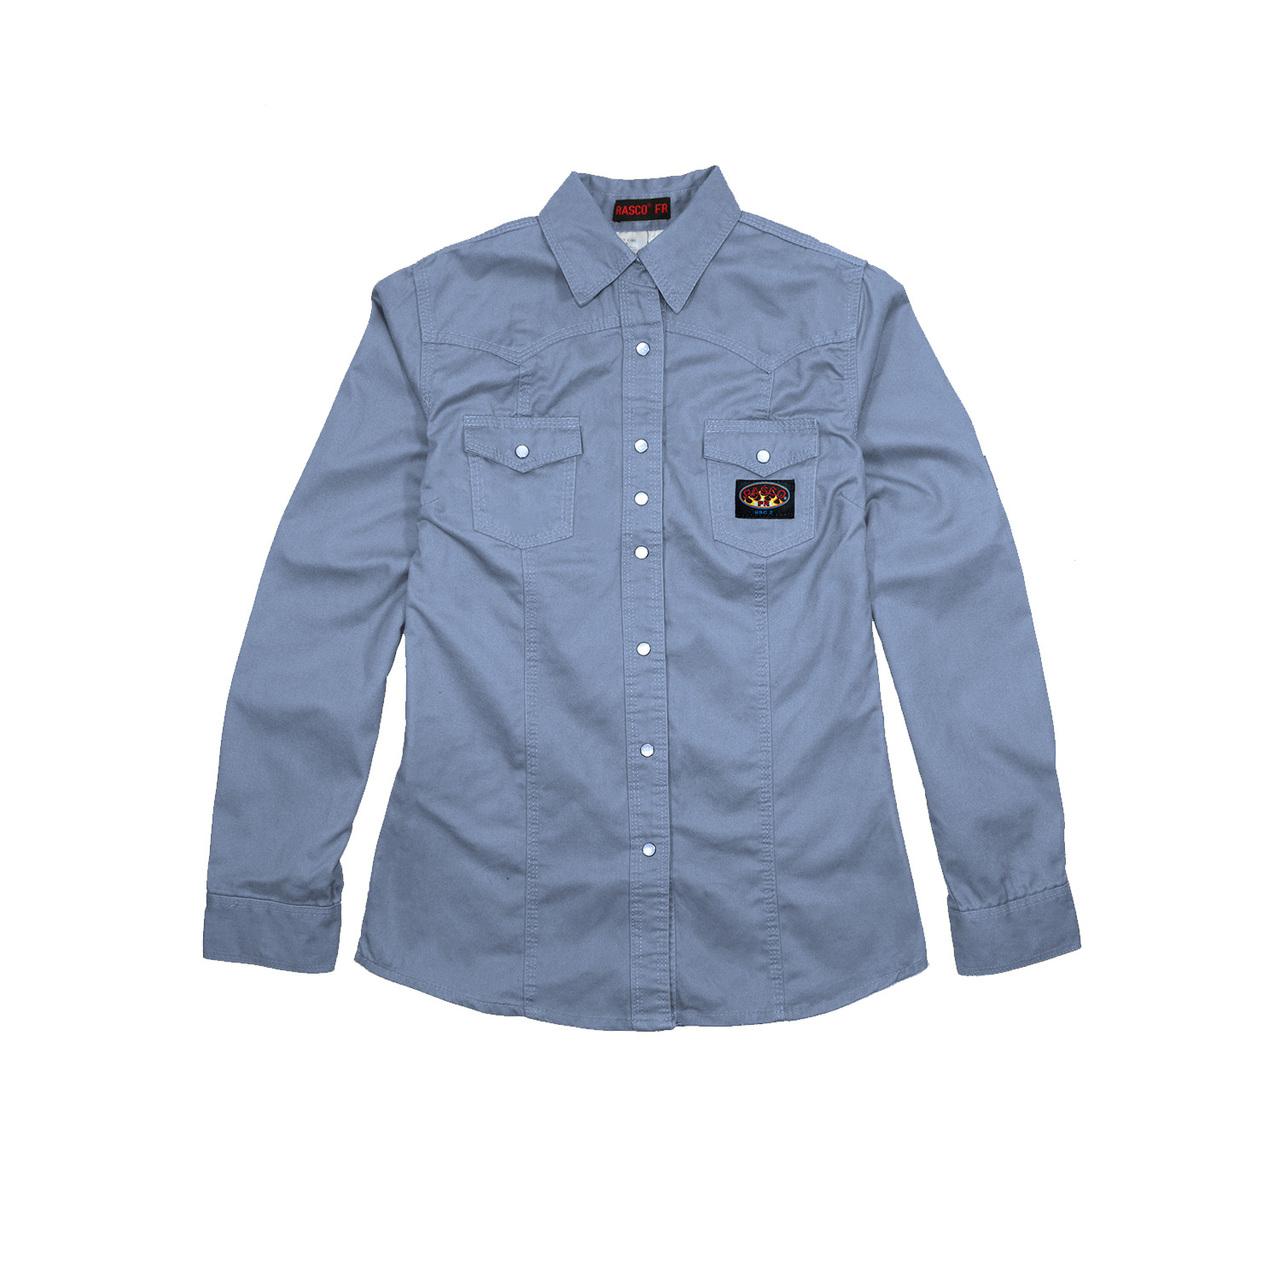 8b0e8fb20c RASCO FR Women s Shirts - Snaps - Metro Industrial Supply